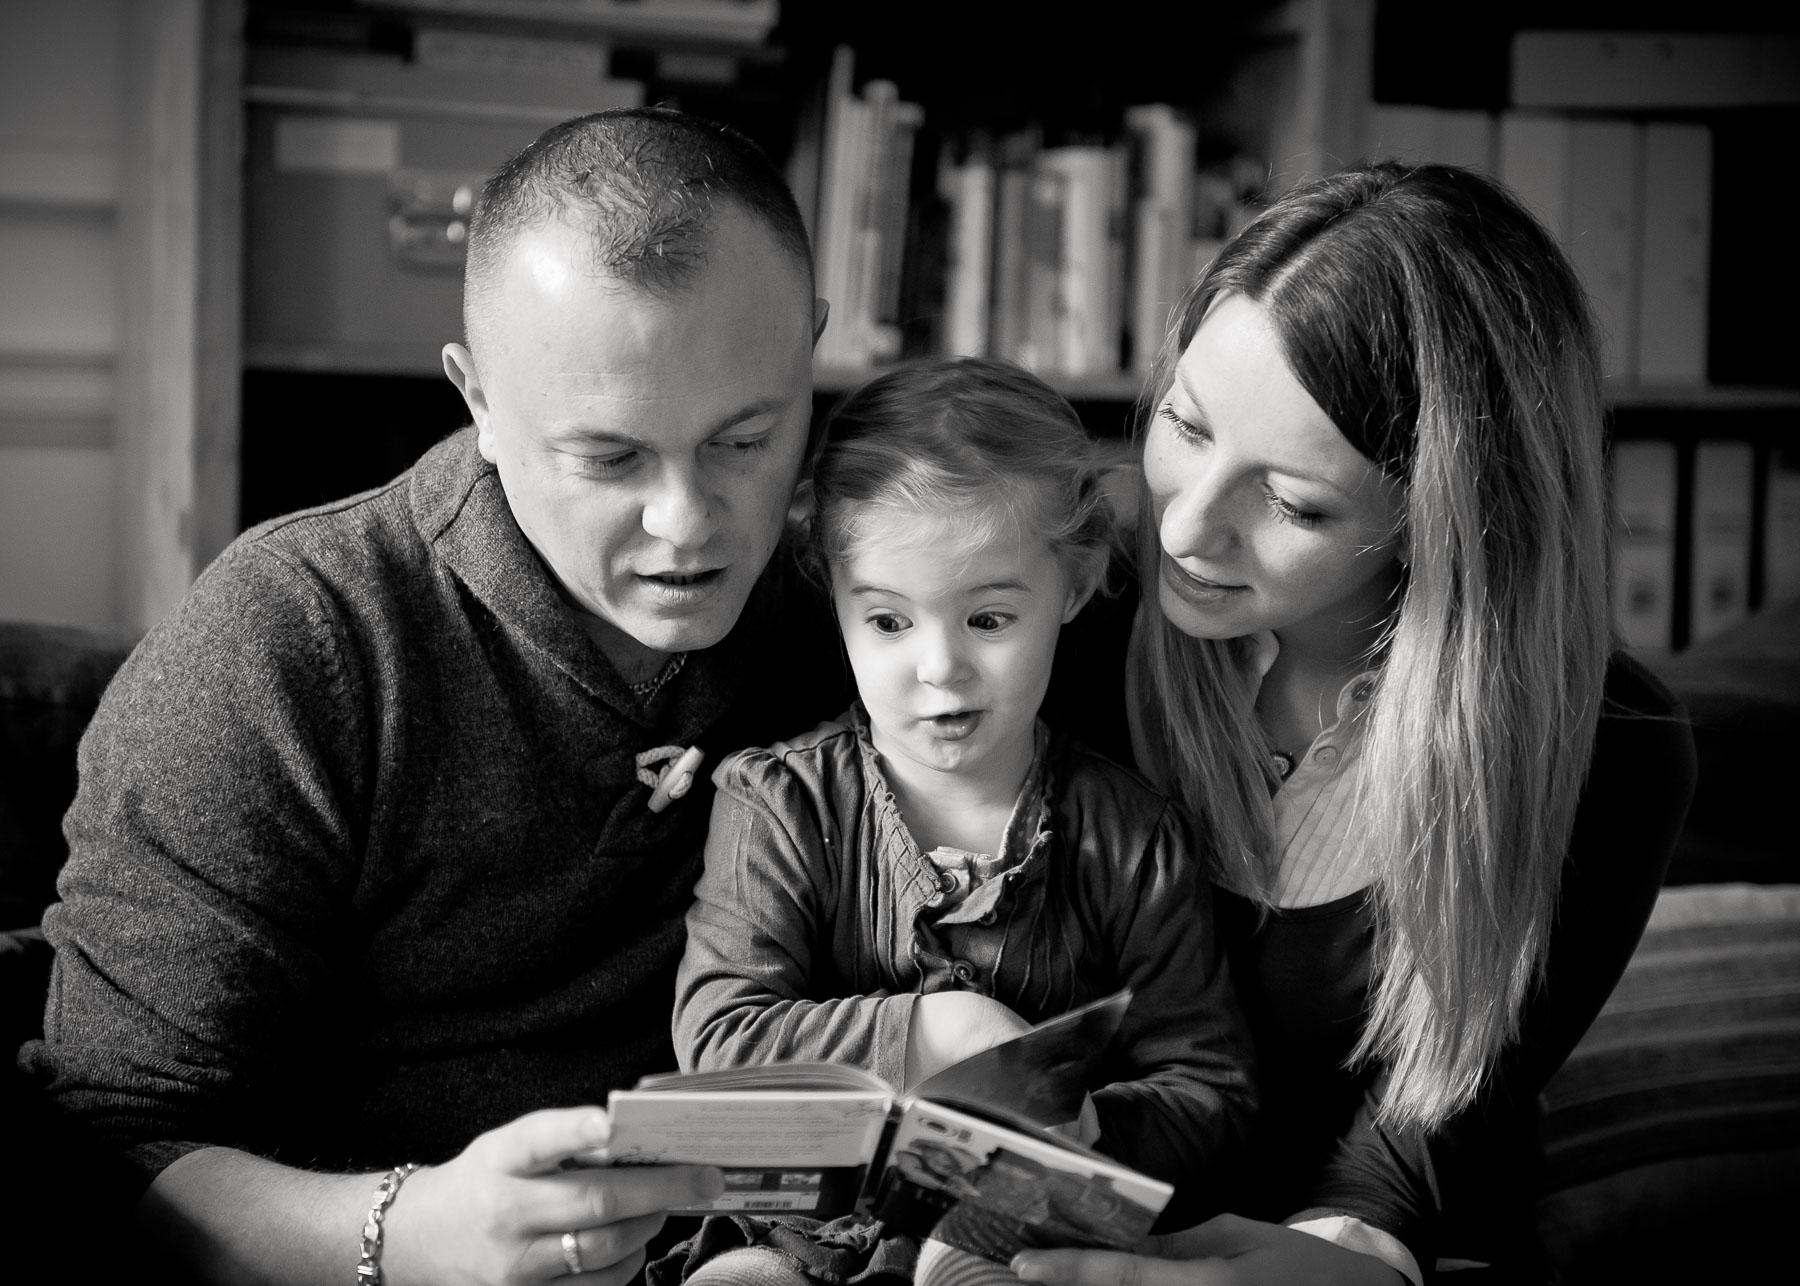 Childrens photography london-2154.jpg